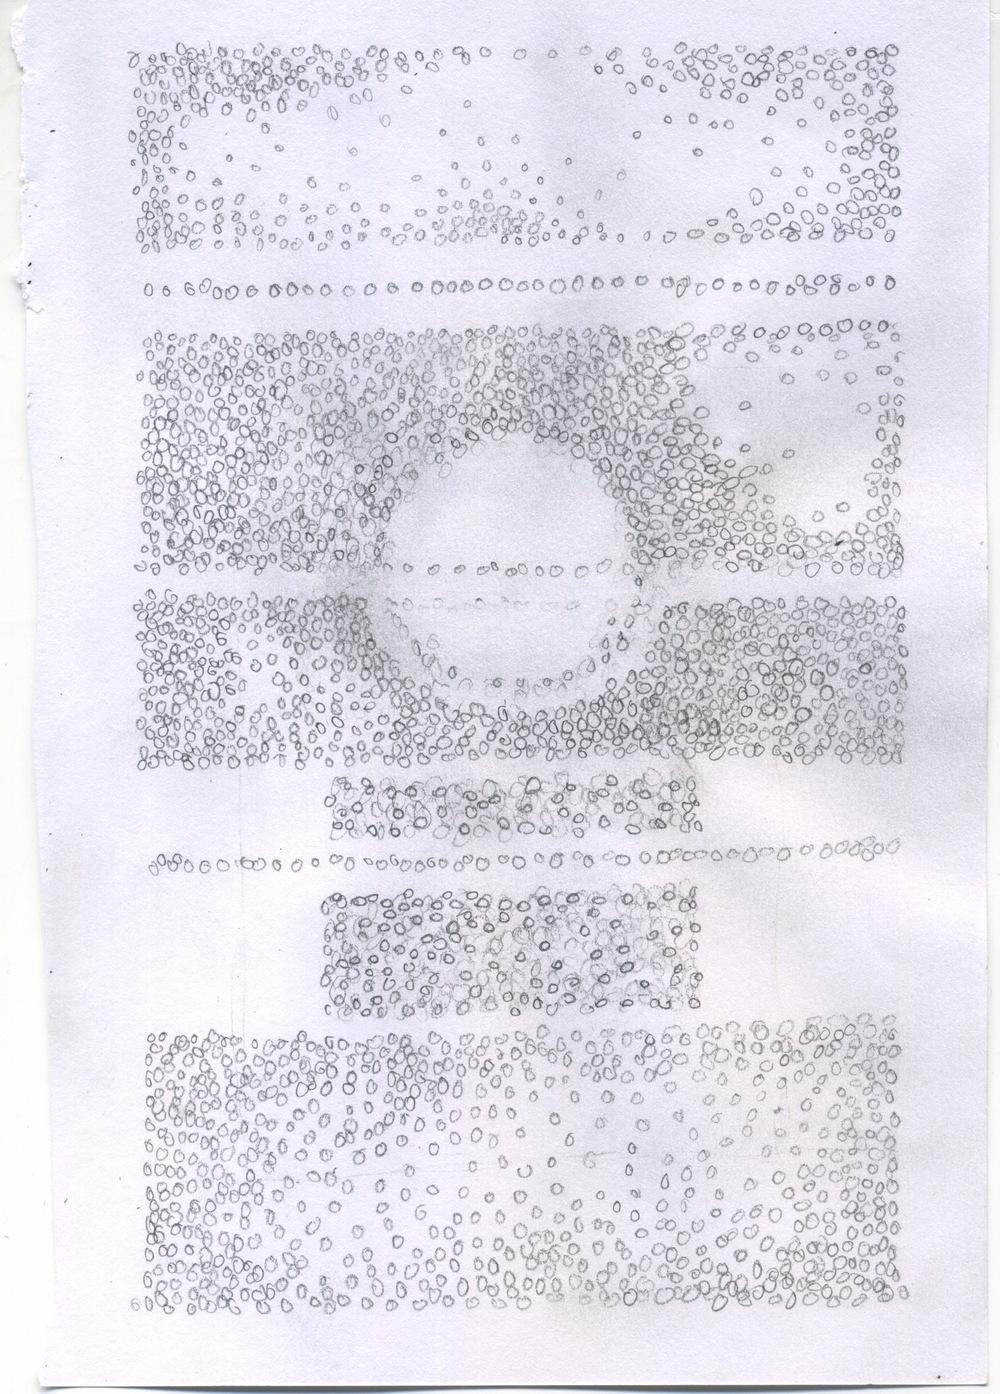 Scan 35.jpeg